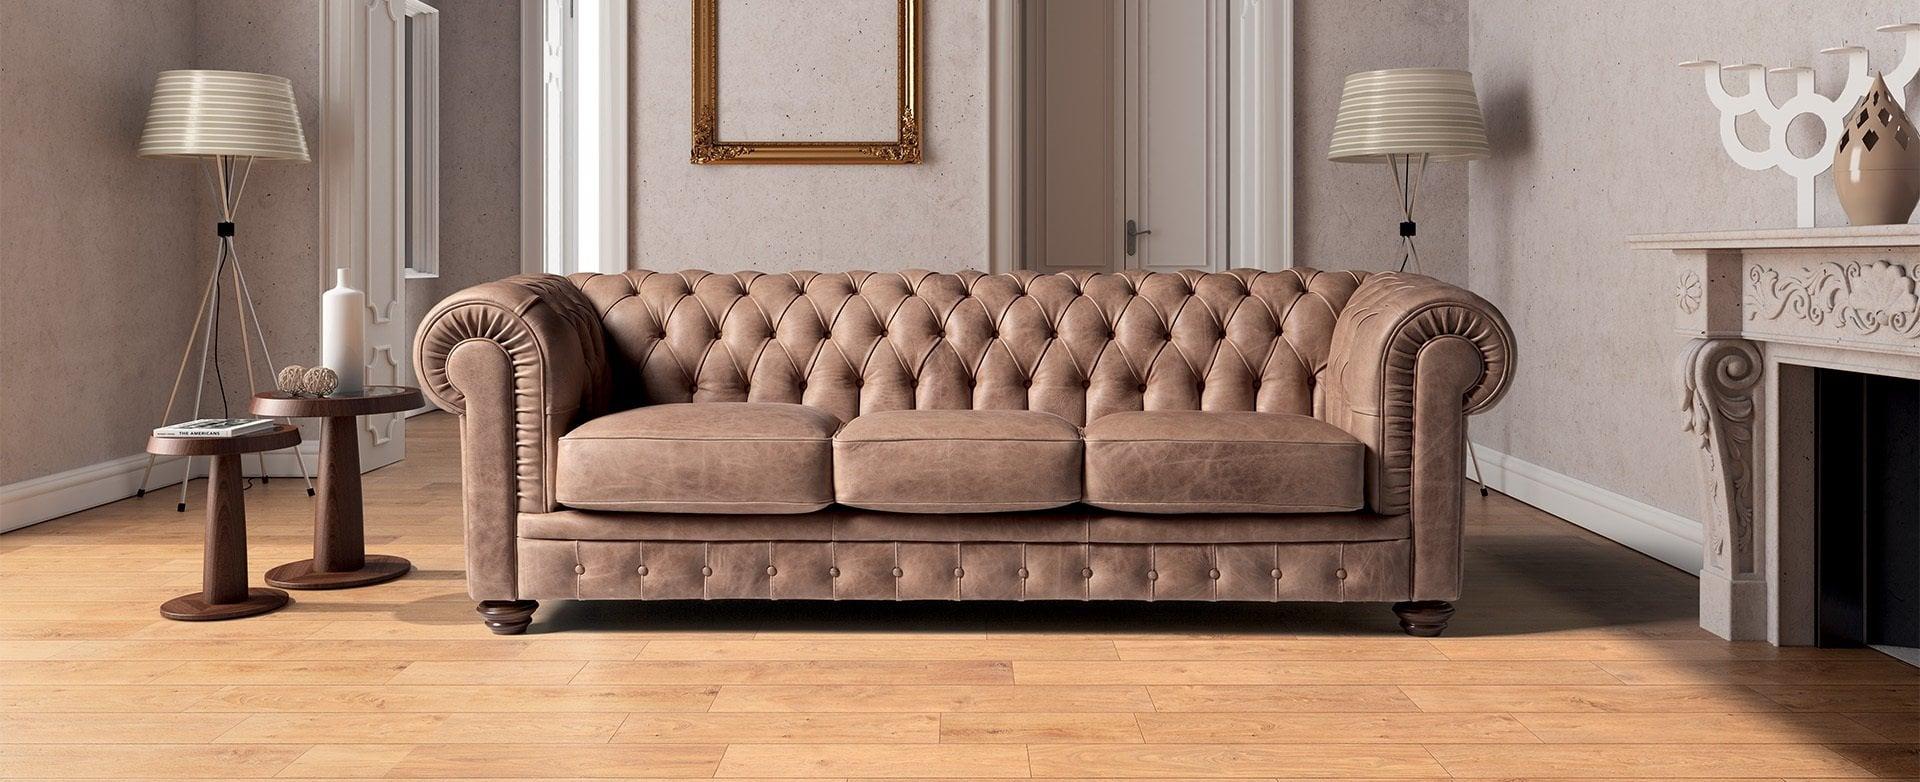 Swell Bespoke Furniture Raffertys Furniture Store Download Free Architecture Designs Jebrpmadebymaigaardcom